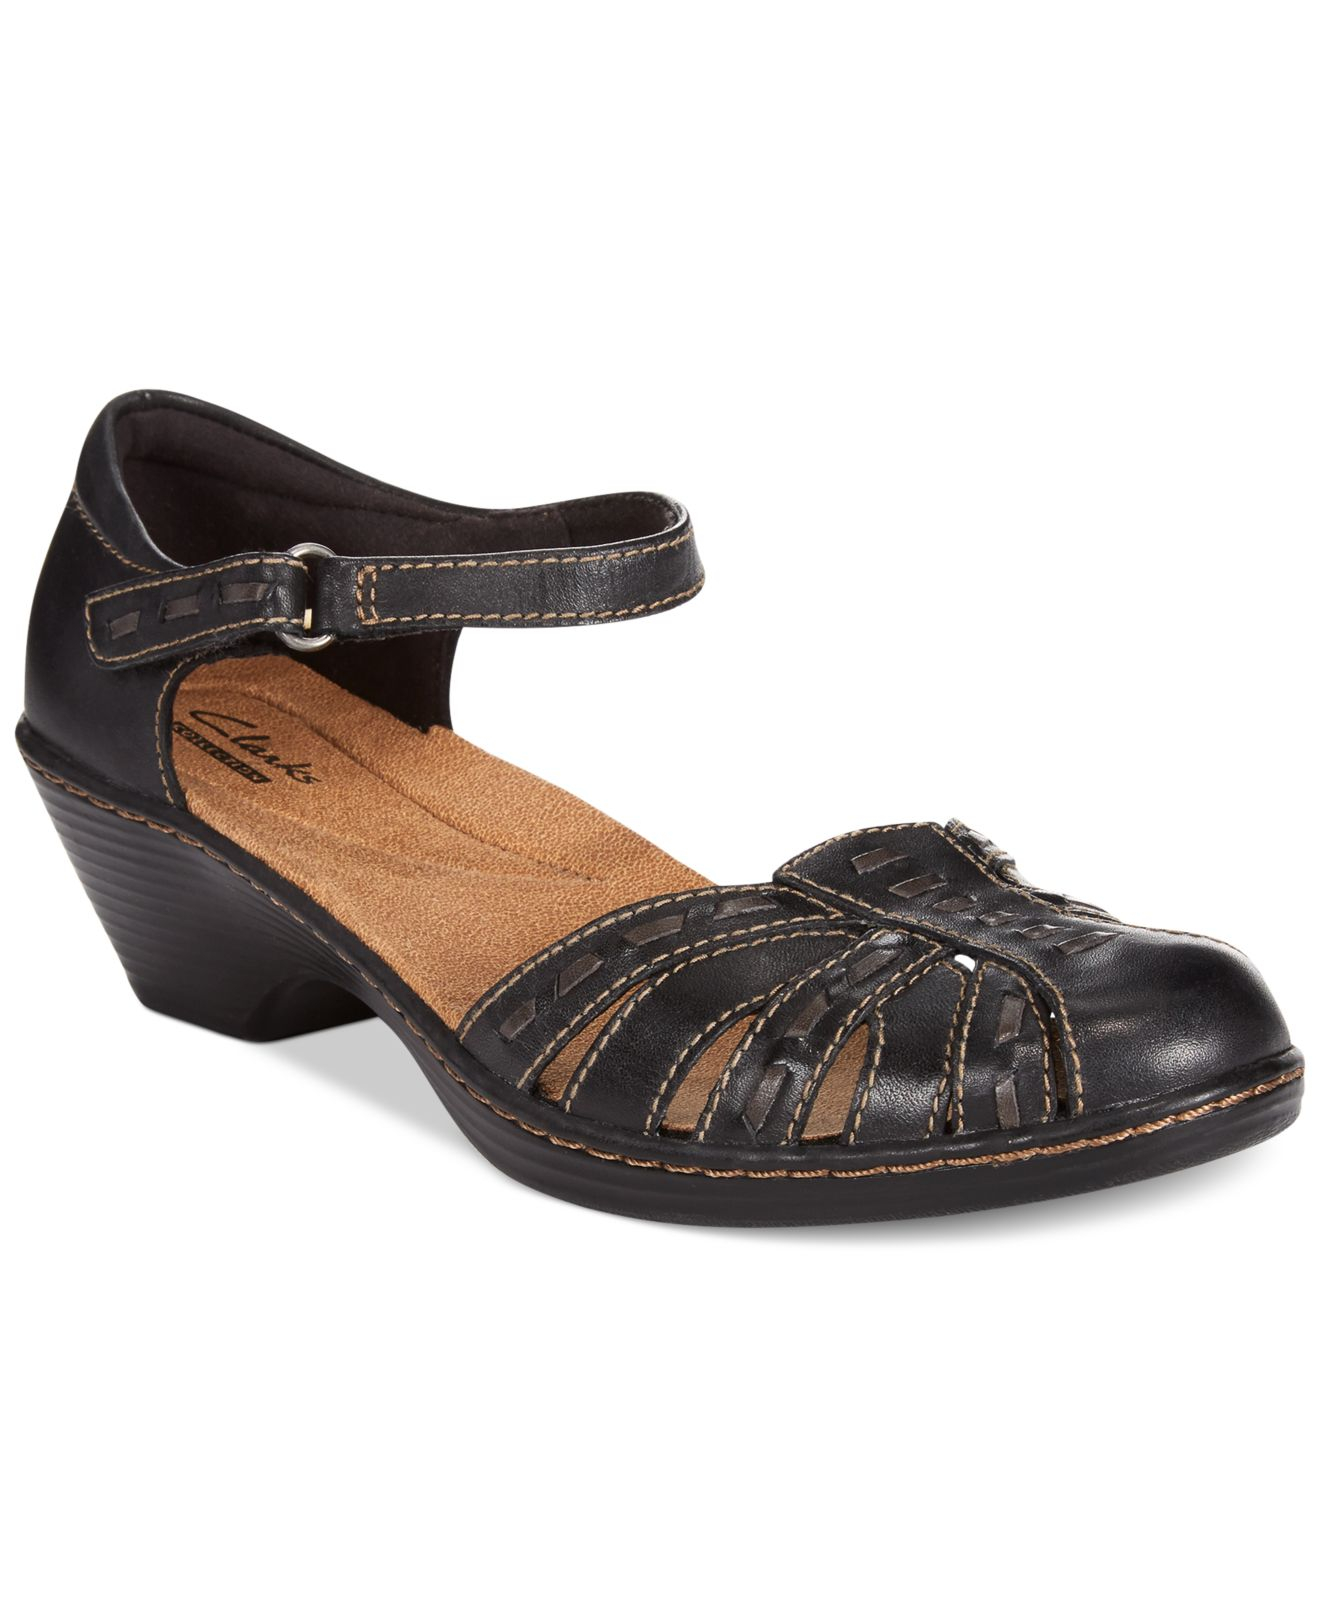 Cool Aerosole Sandals Clarks Lexi Bark Slide Sandals For Ladies Black